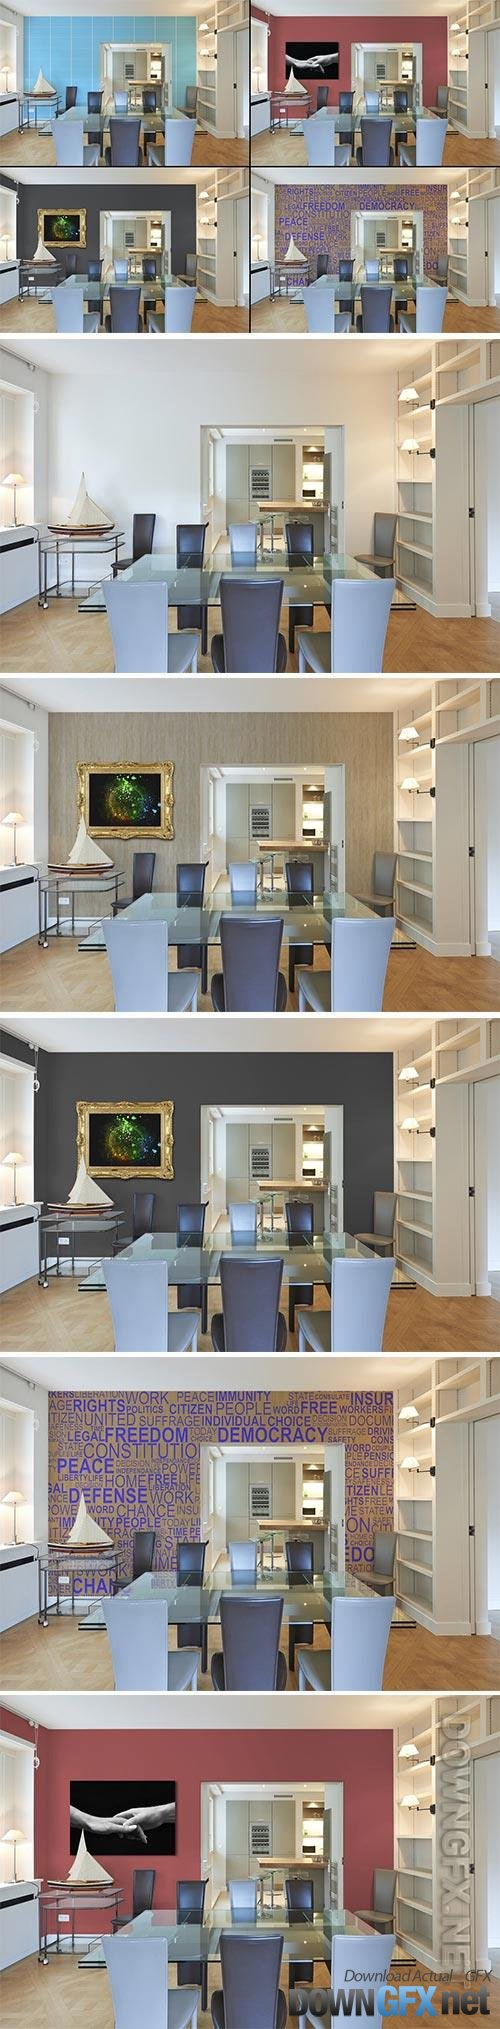 Dining Room_Kitchen_Mockup